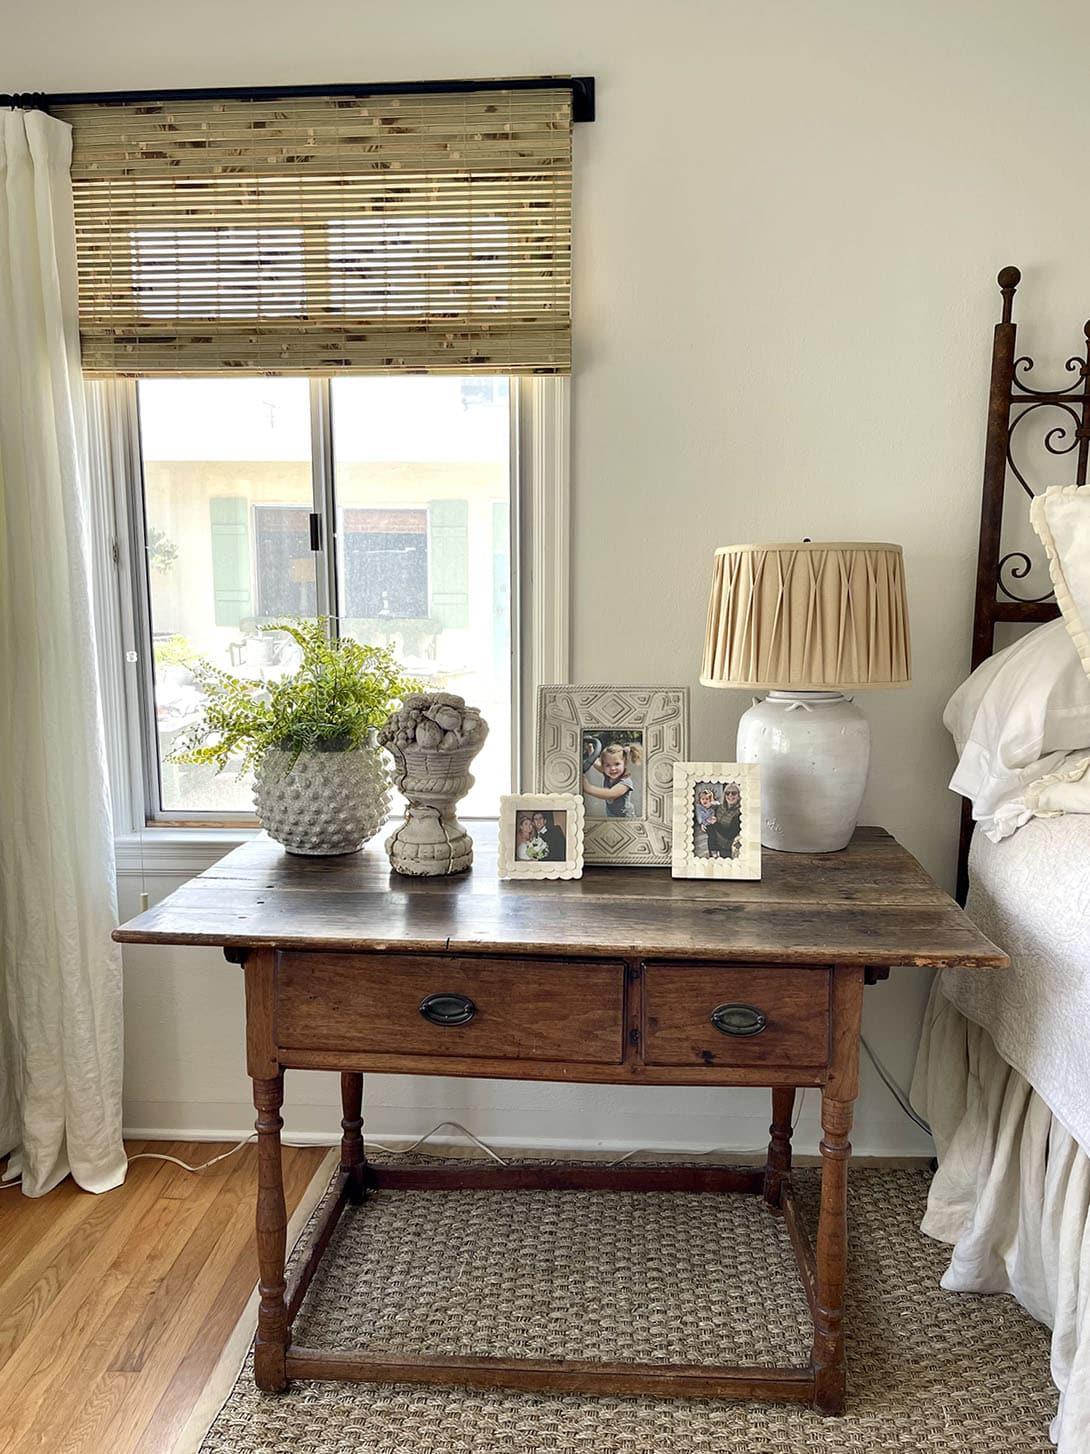 cindy hattersley's bedside table in her fixer upper bedroom